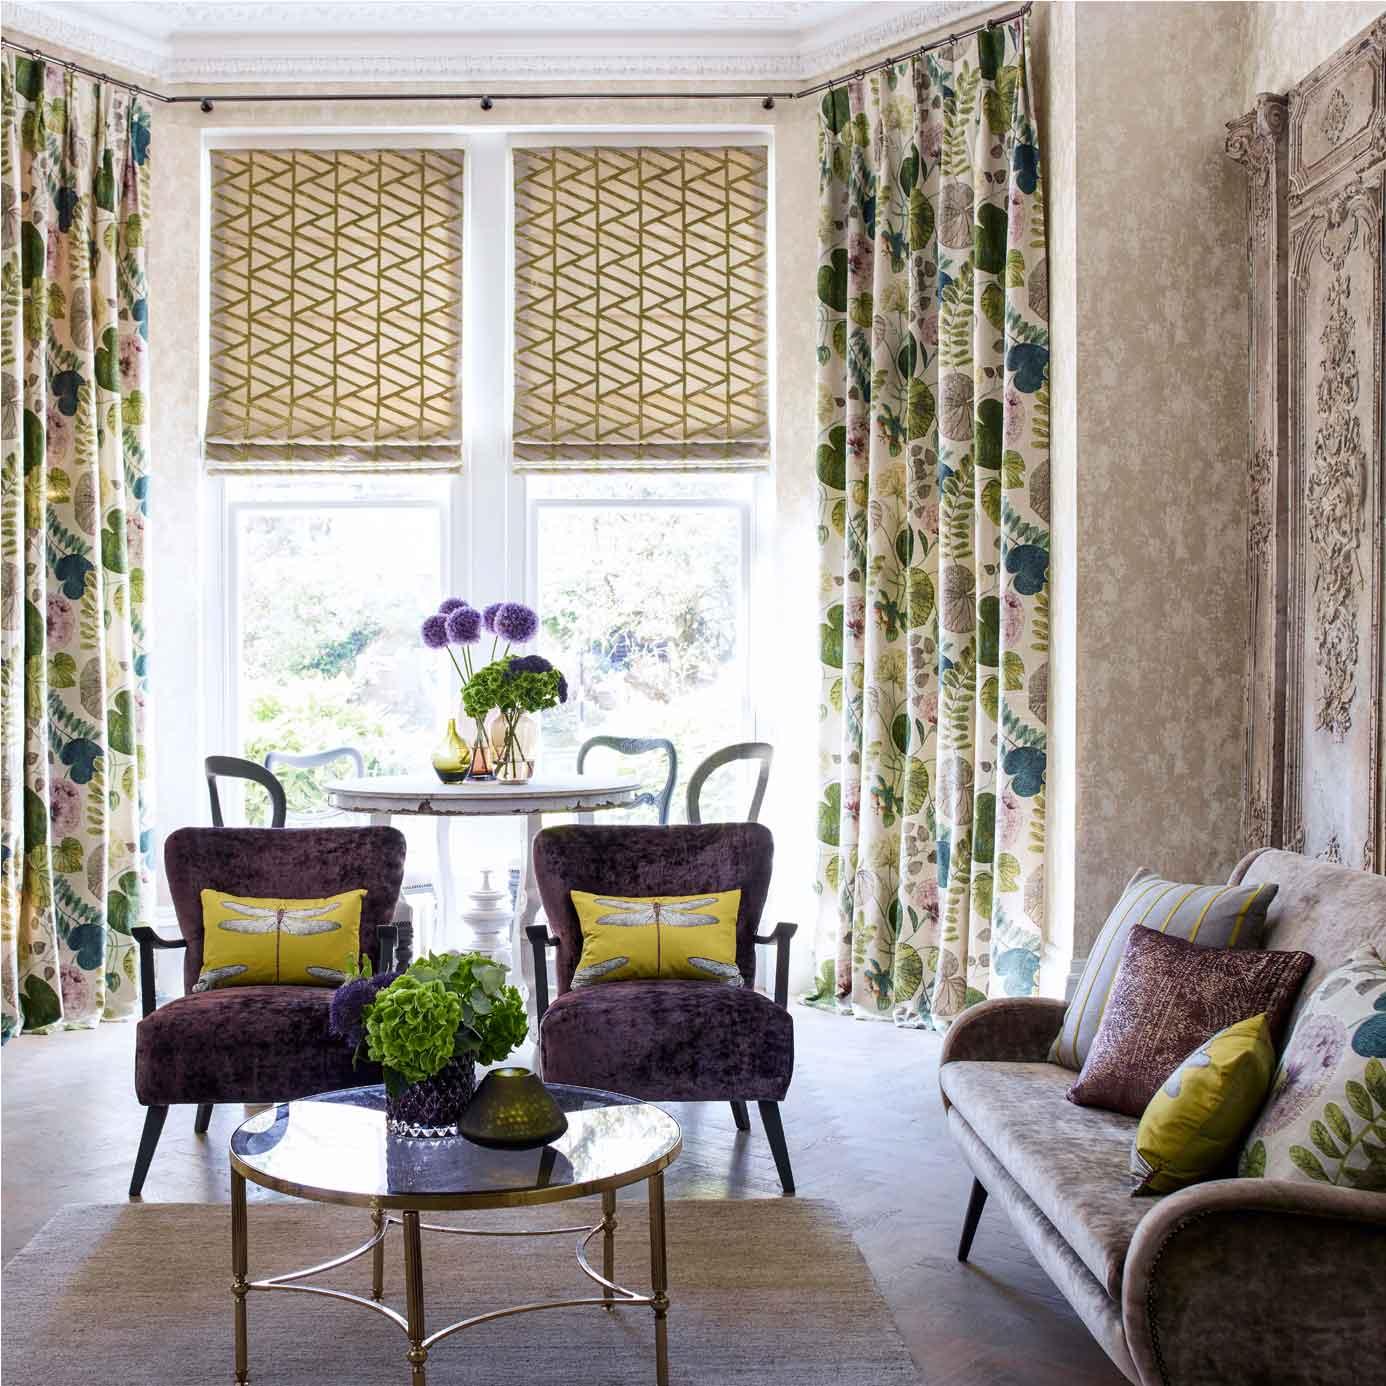 Products harlequin designer fabrics and wallpapers paradise - Harlequin Palmetto Dardanella Dinning Room Green Dardenella Fabric